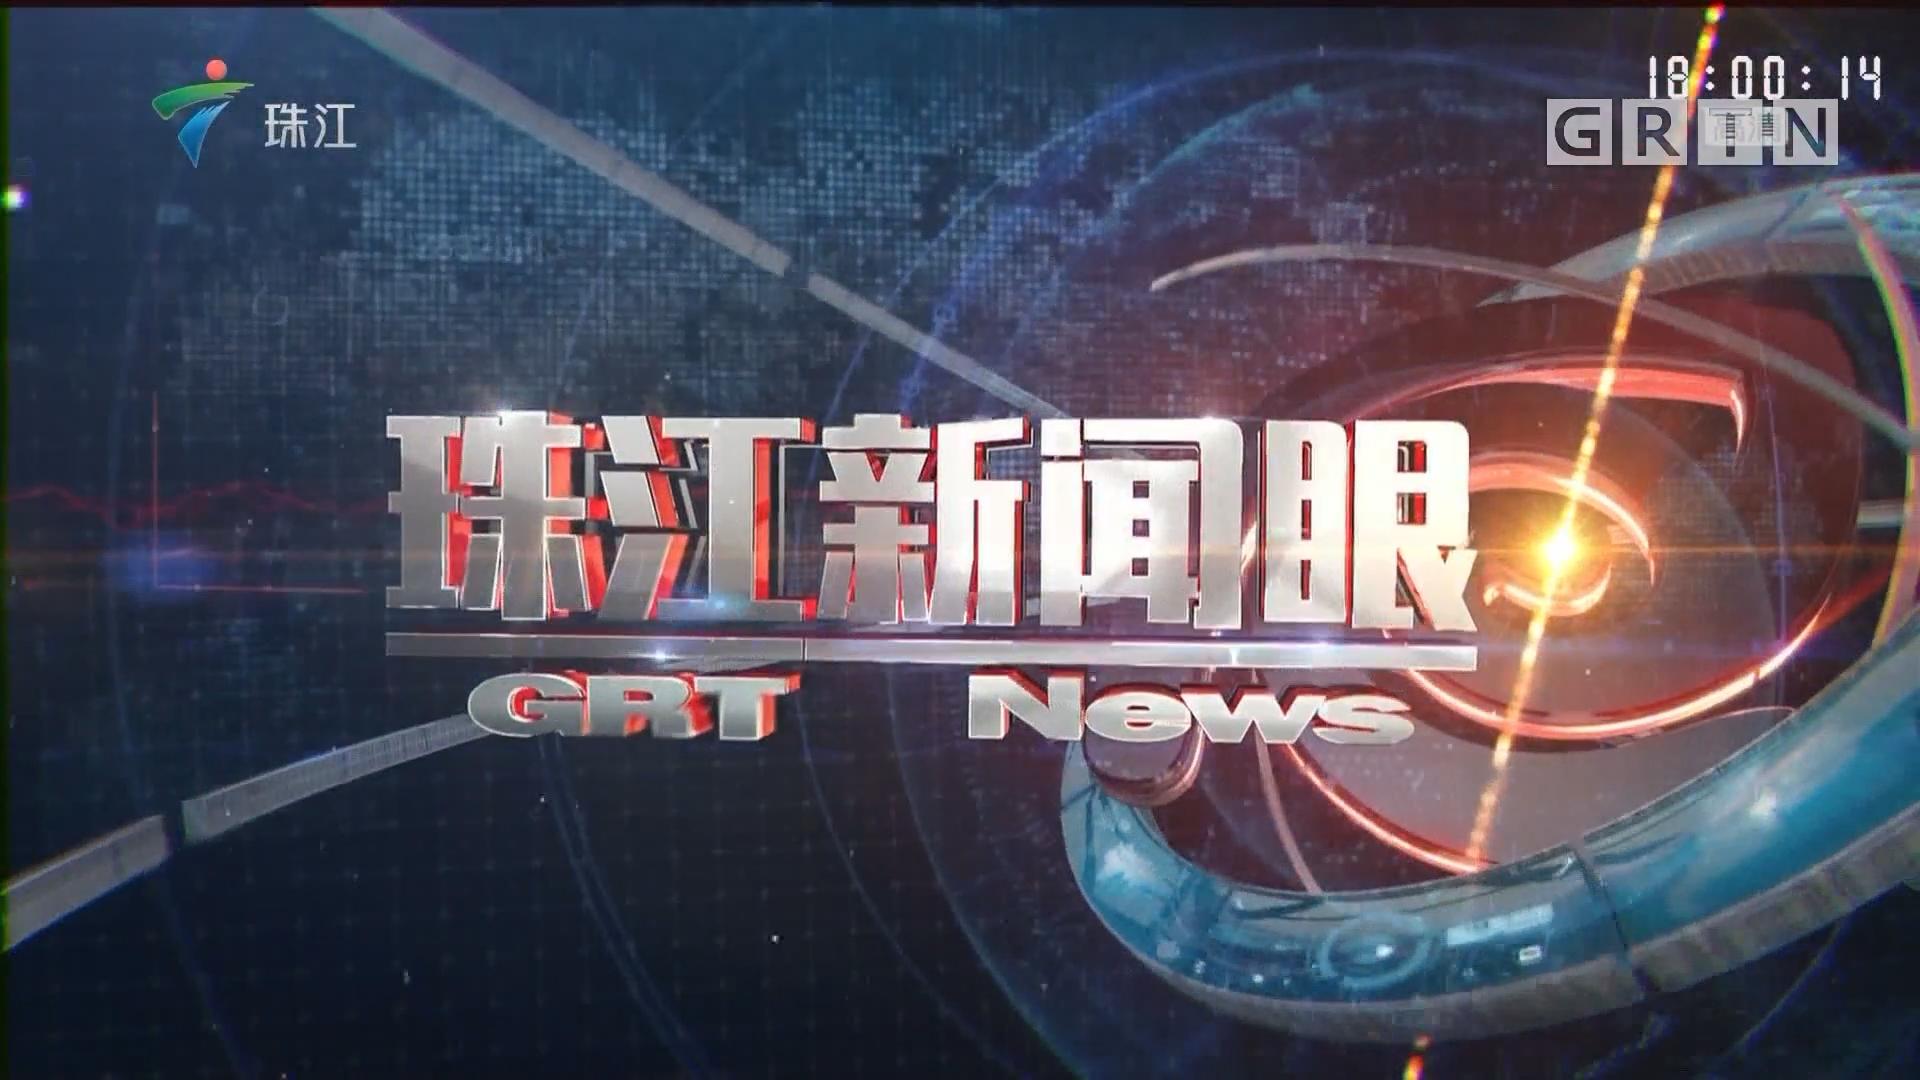 [HD][2019-01-15]珠江新闻眼:广州市政协十三届三次会议开幕